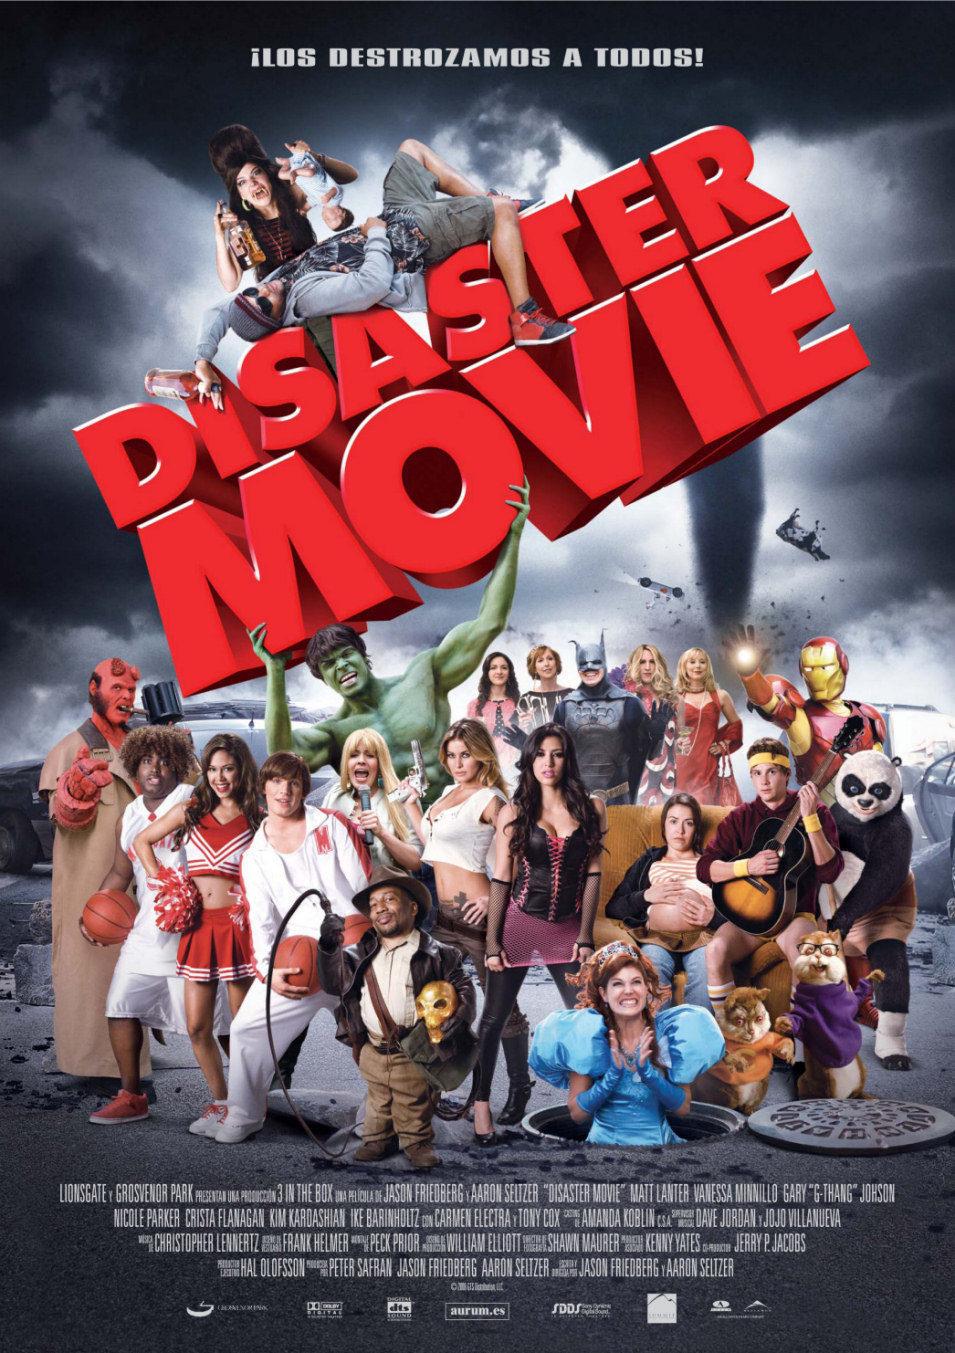 España poster for Disaster Movie